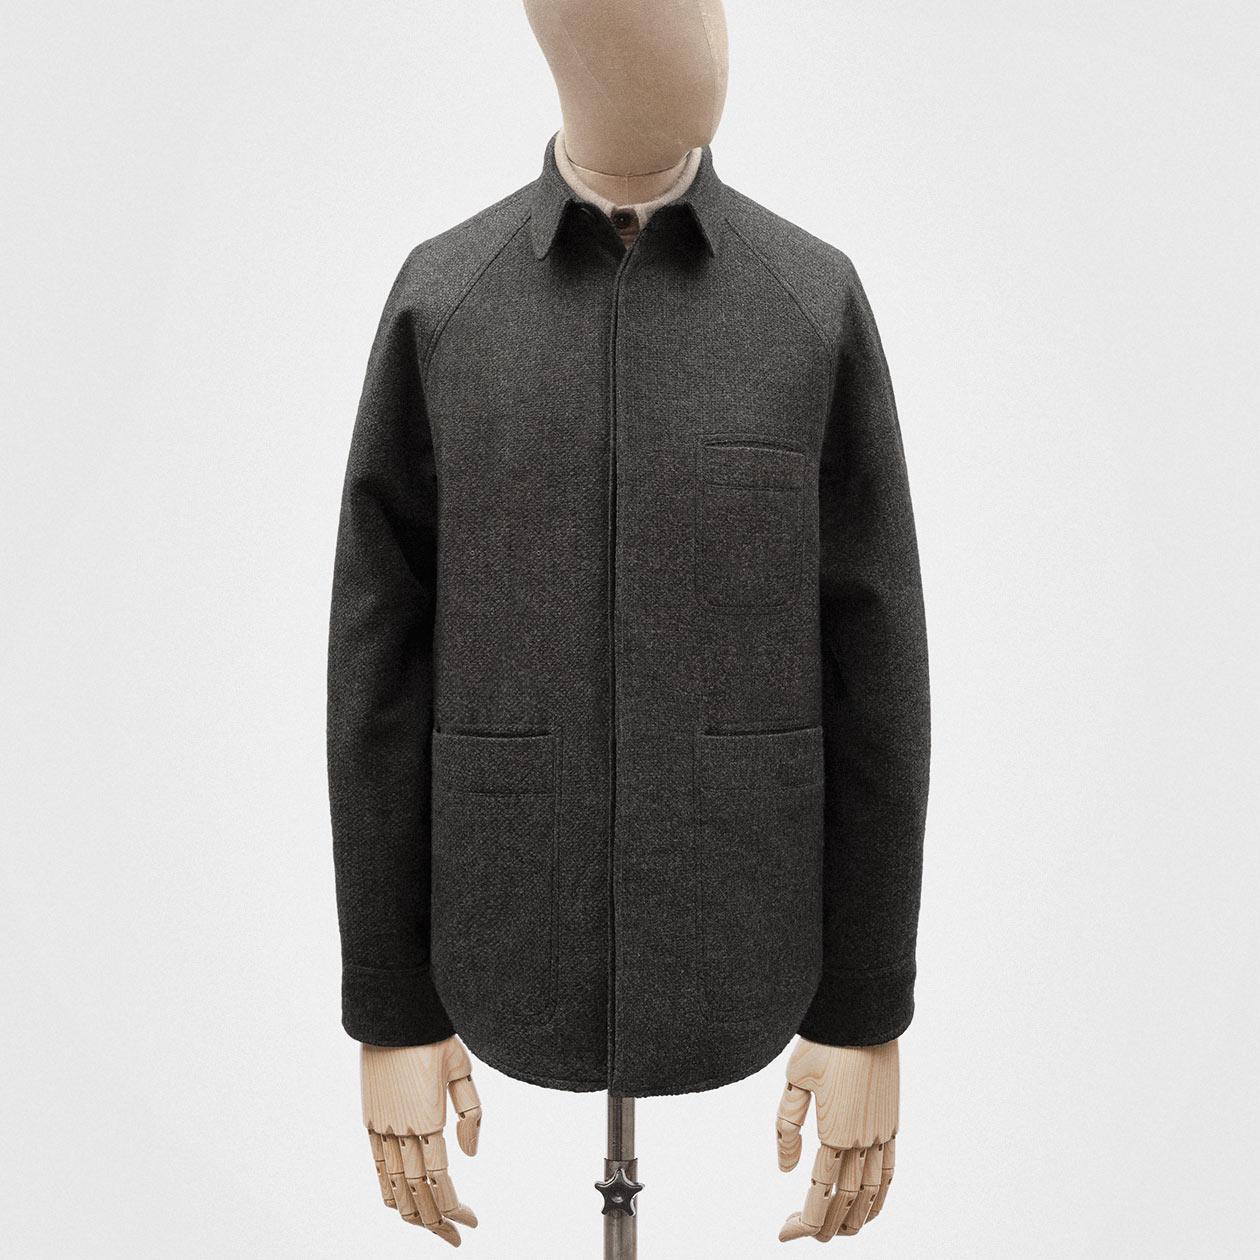 overshirt-dark-grey-knit-wool-1@2x.jpg